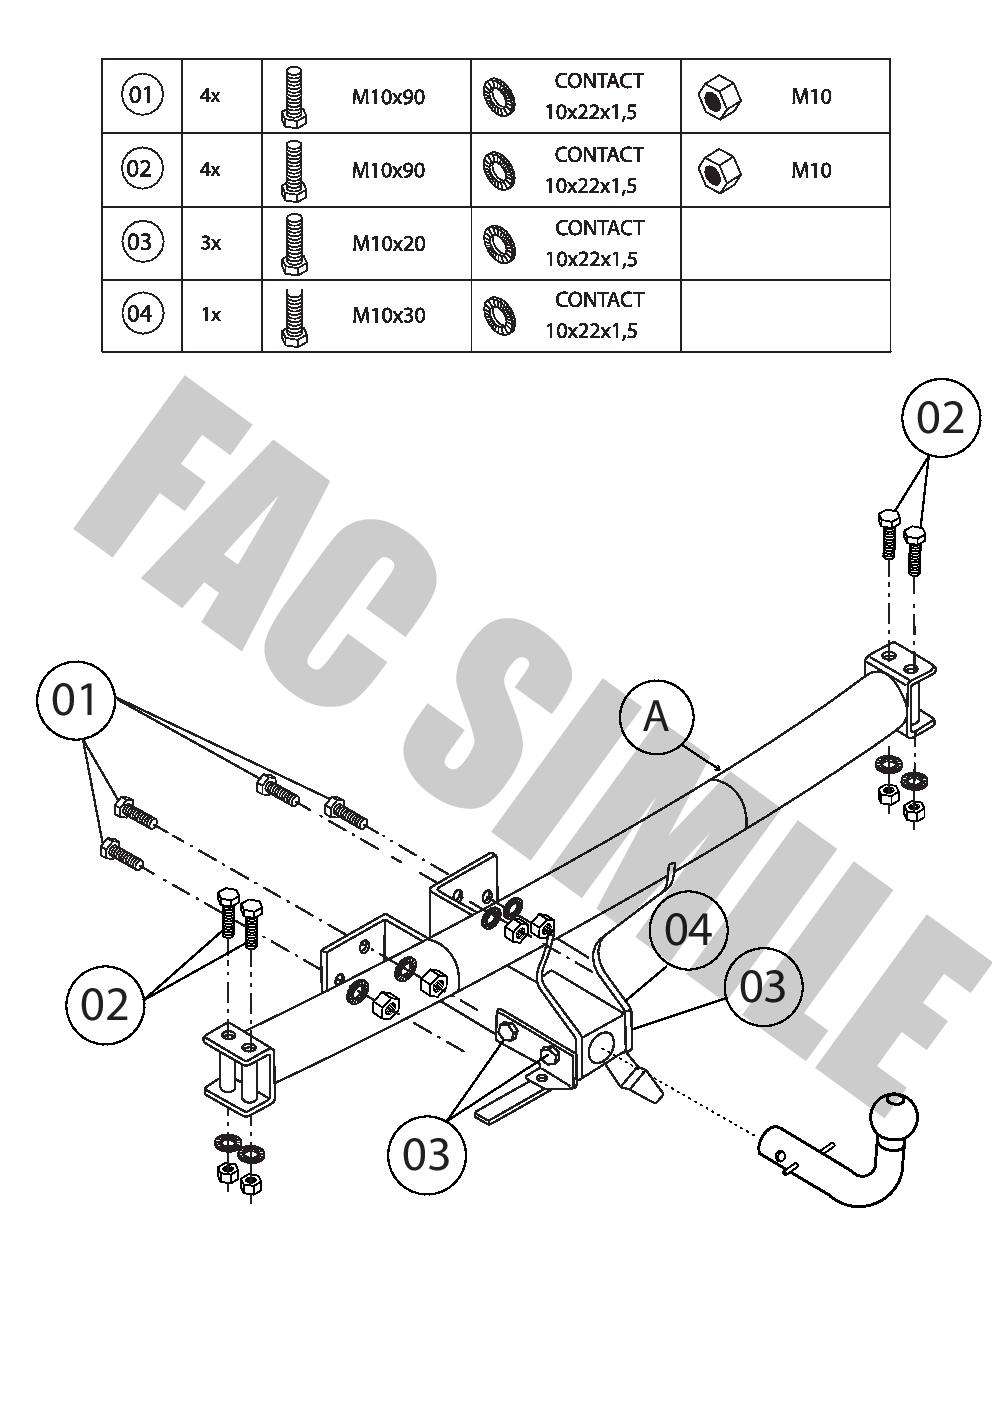 Attelage Col Cygne Faisceaux 7Br pour Rover FREELANII SUV 4 WD 07-12 03026//F/_B1